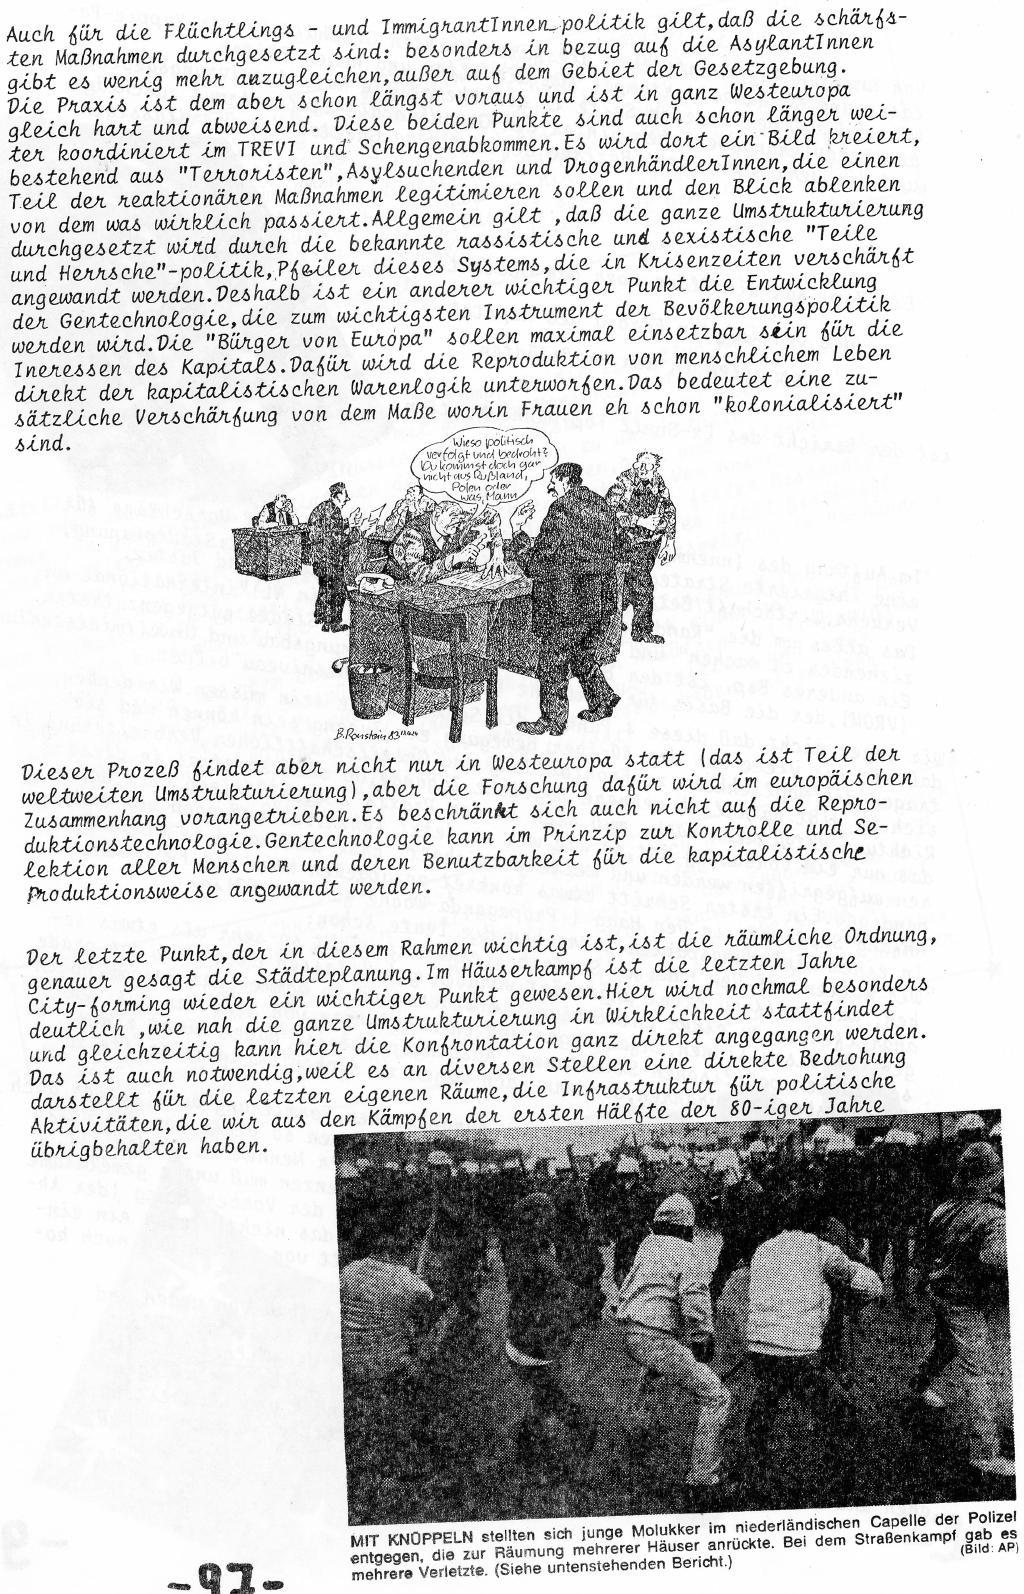 Belgien_Doku_Besetzung_EG_Kommission_1989_099